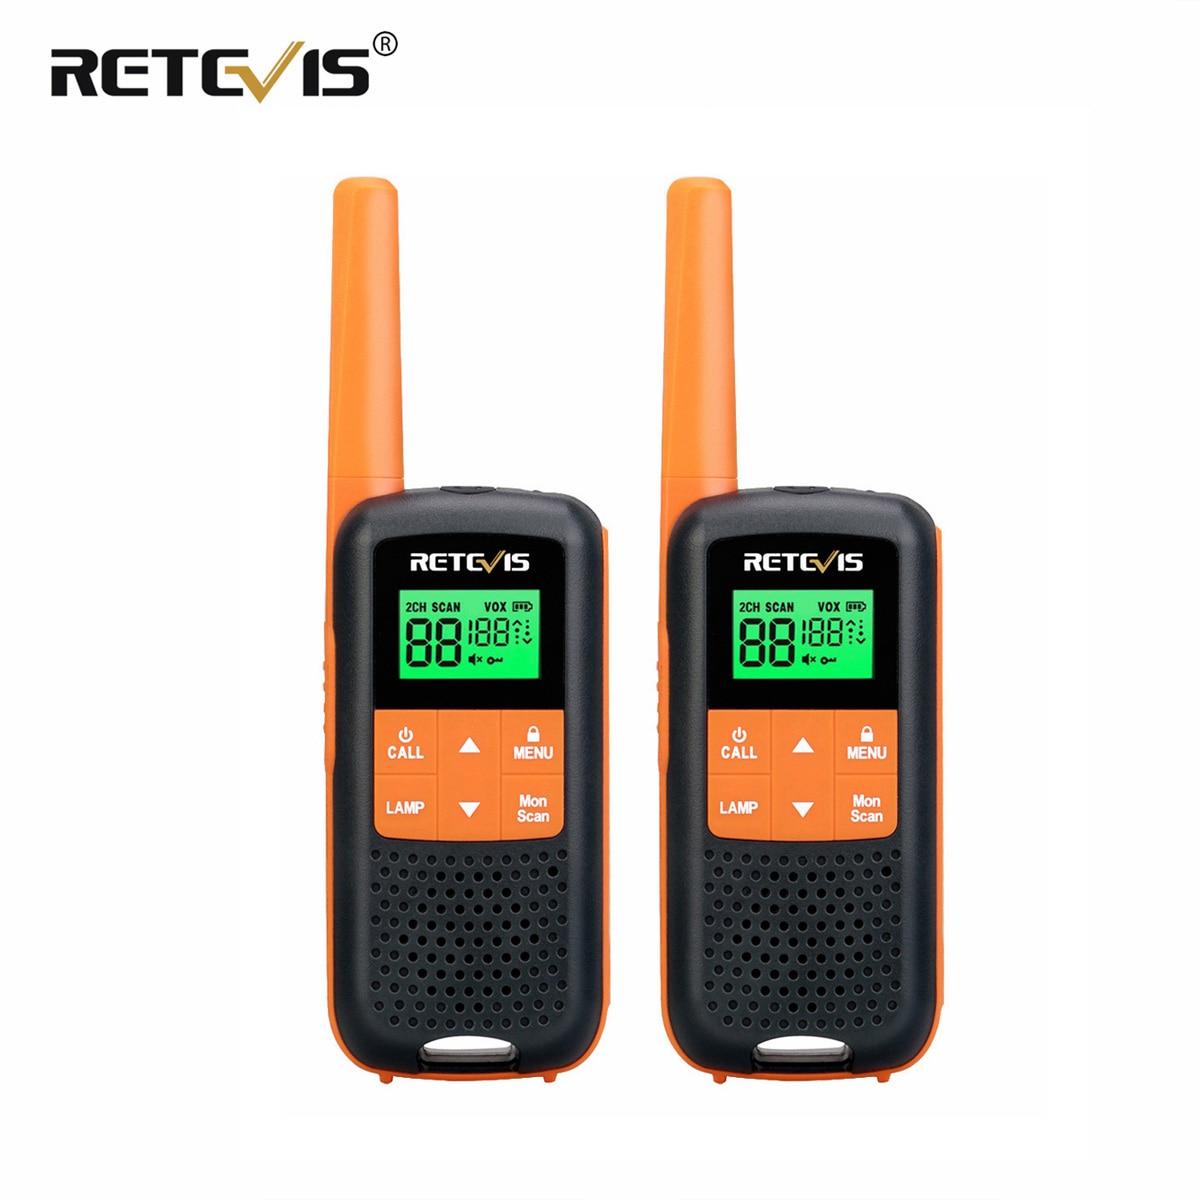 Retevis RT649/RT49 اسلكية تخاطب 2 قطعة IP65 للماء اسلكية اسلكي للصيد UHF PMR446 FRS الطوارئ اتجاهين راديو المحمولة